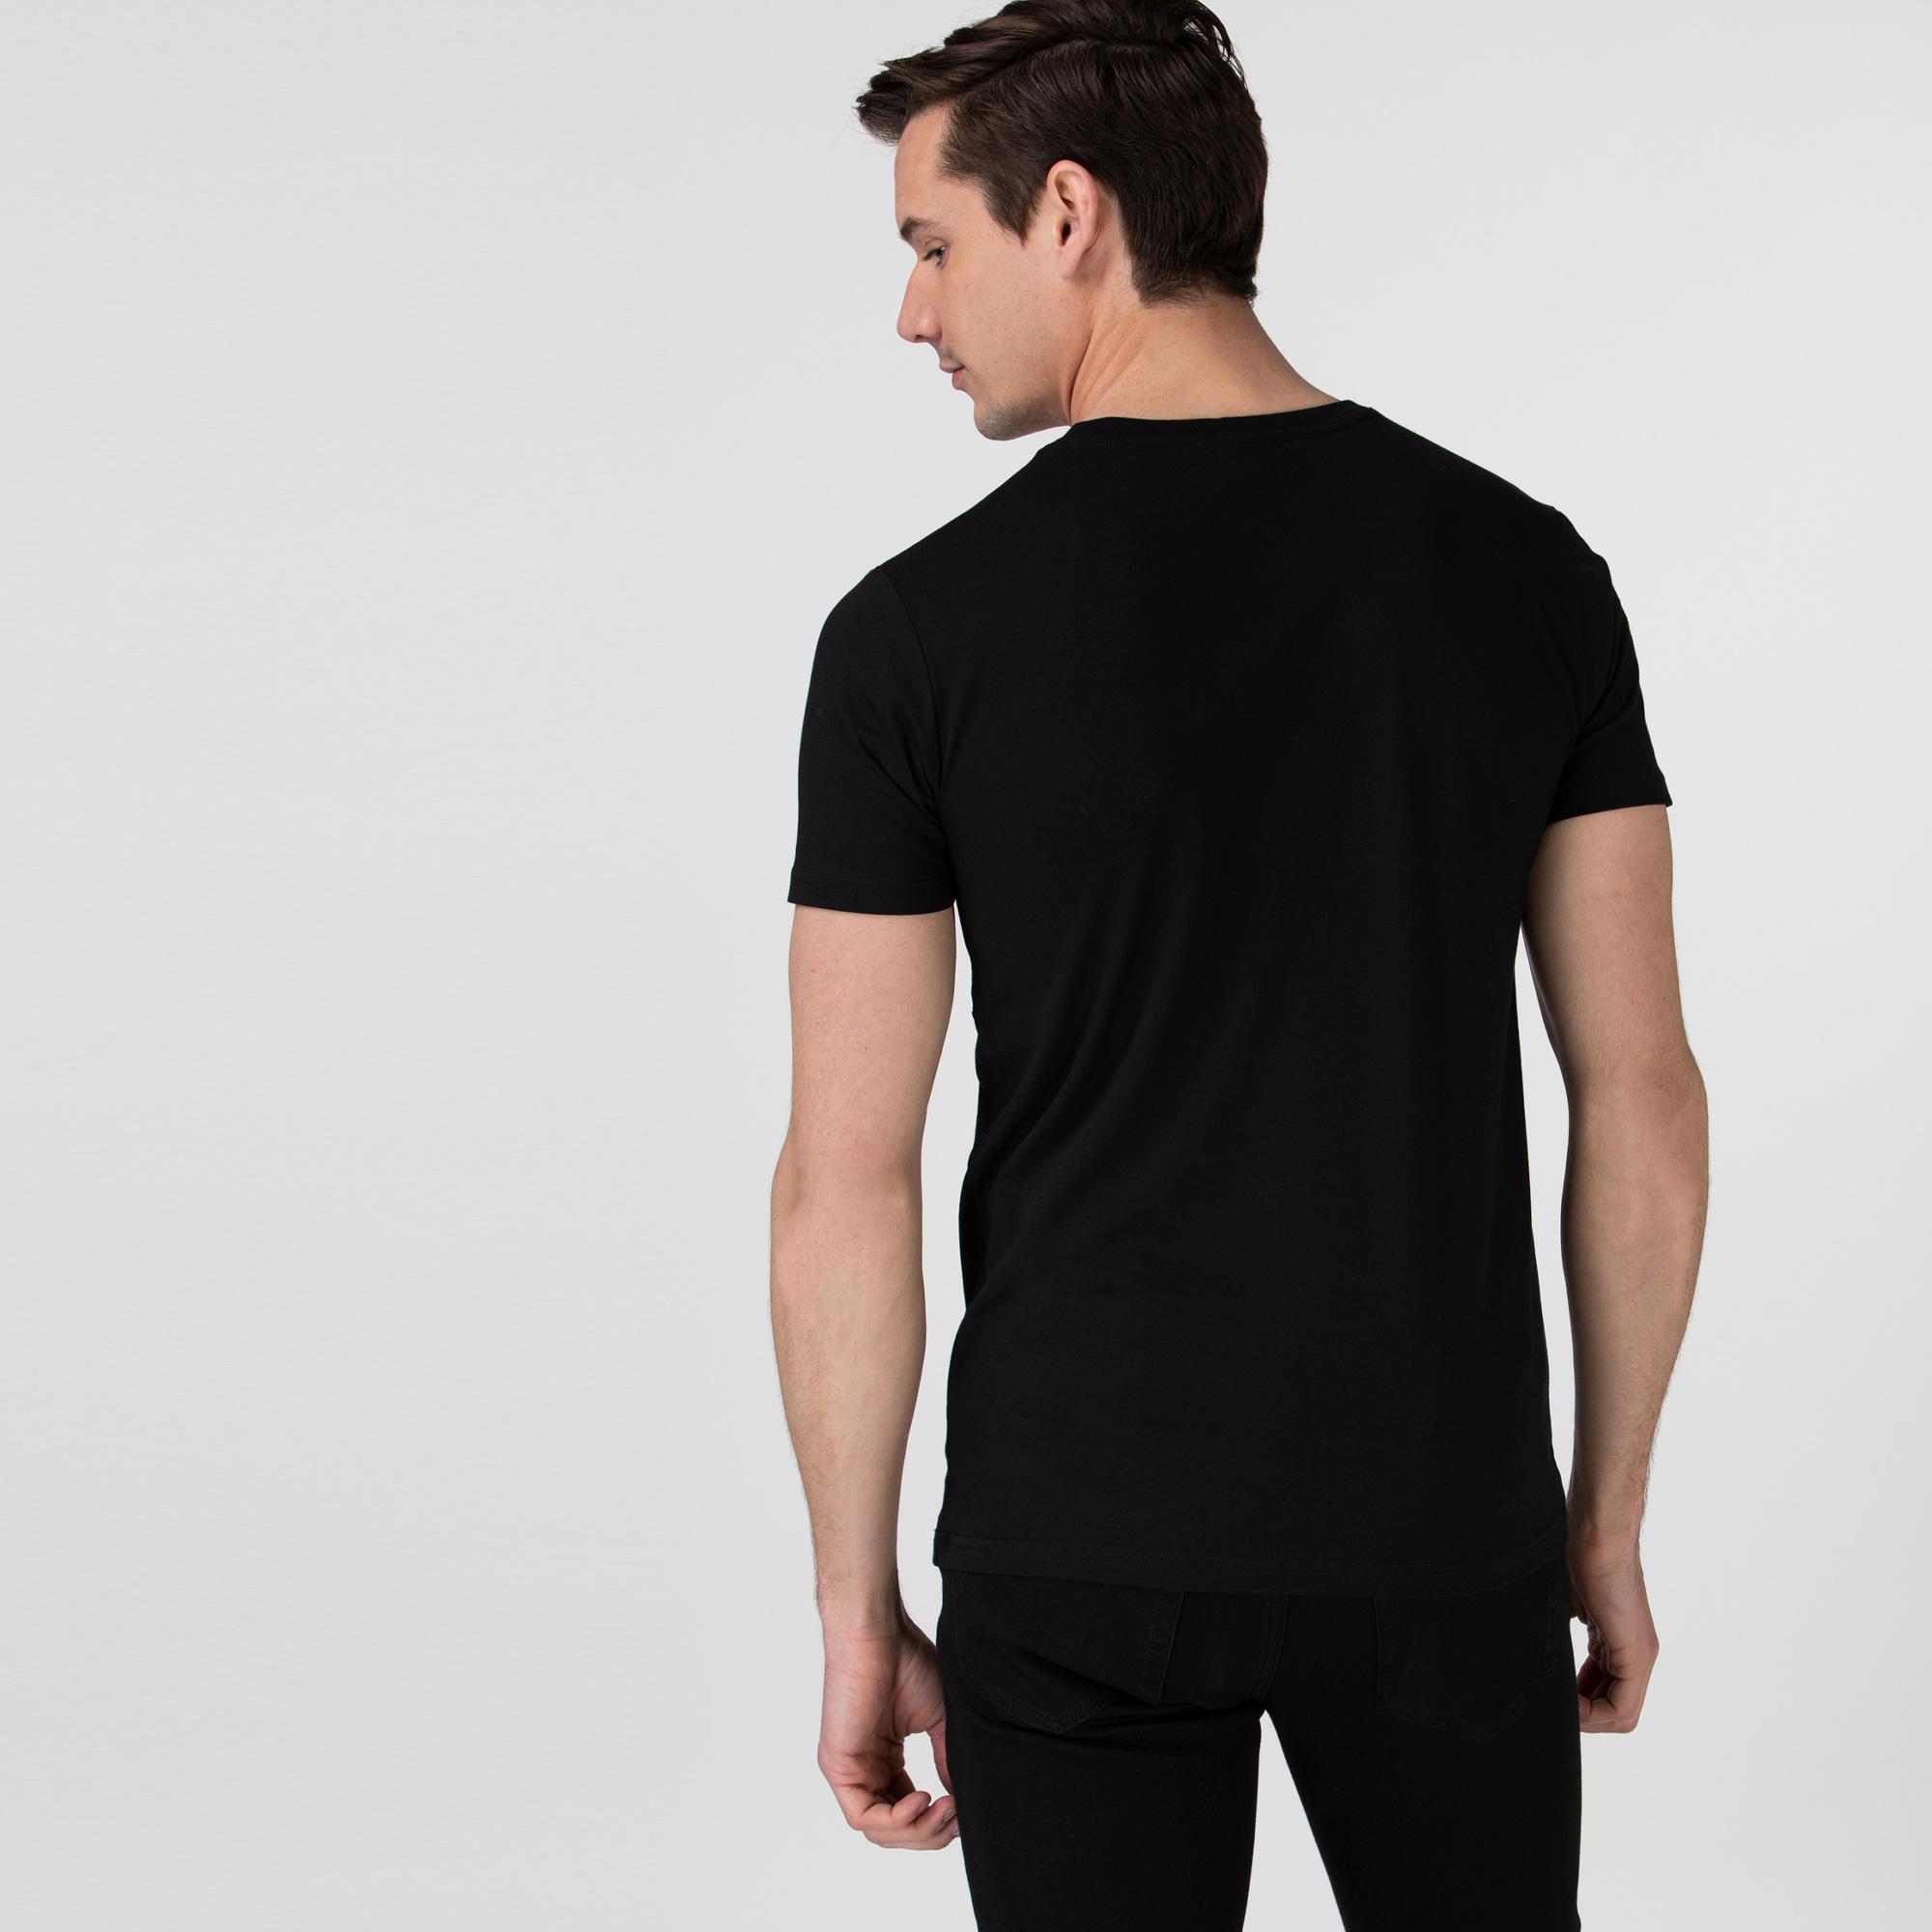 Lacoste Erkek Bisiklet Yaka Desenli Siyah T-Shirt